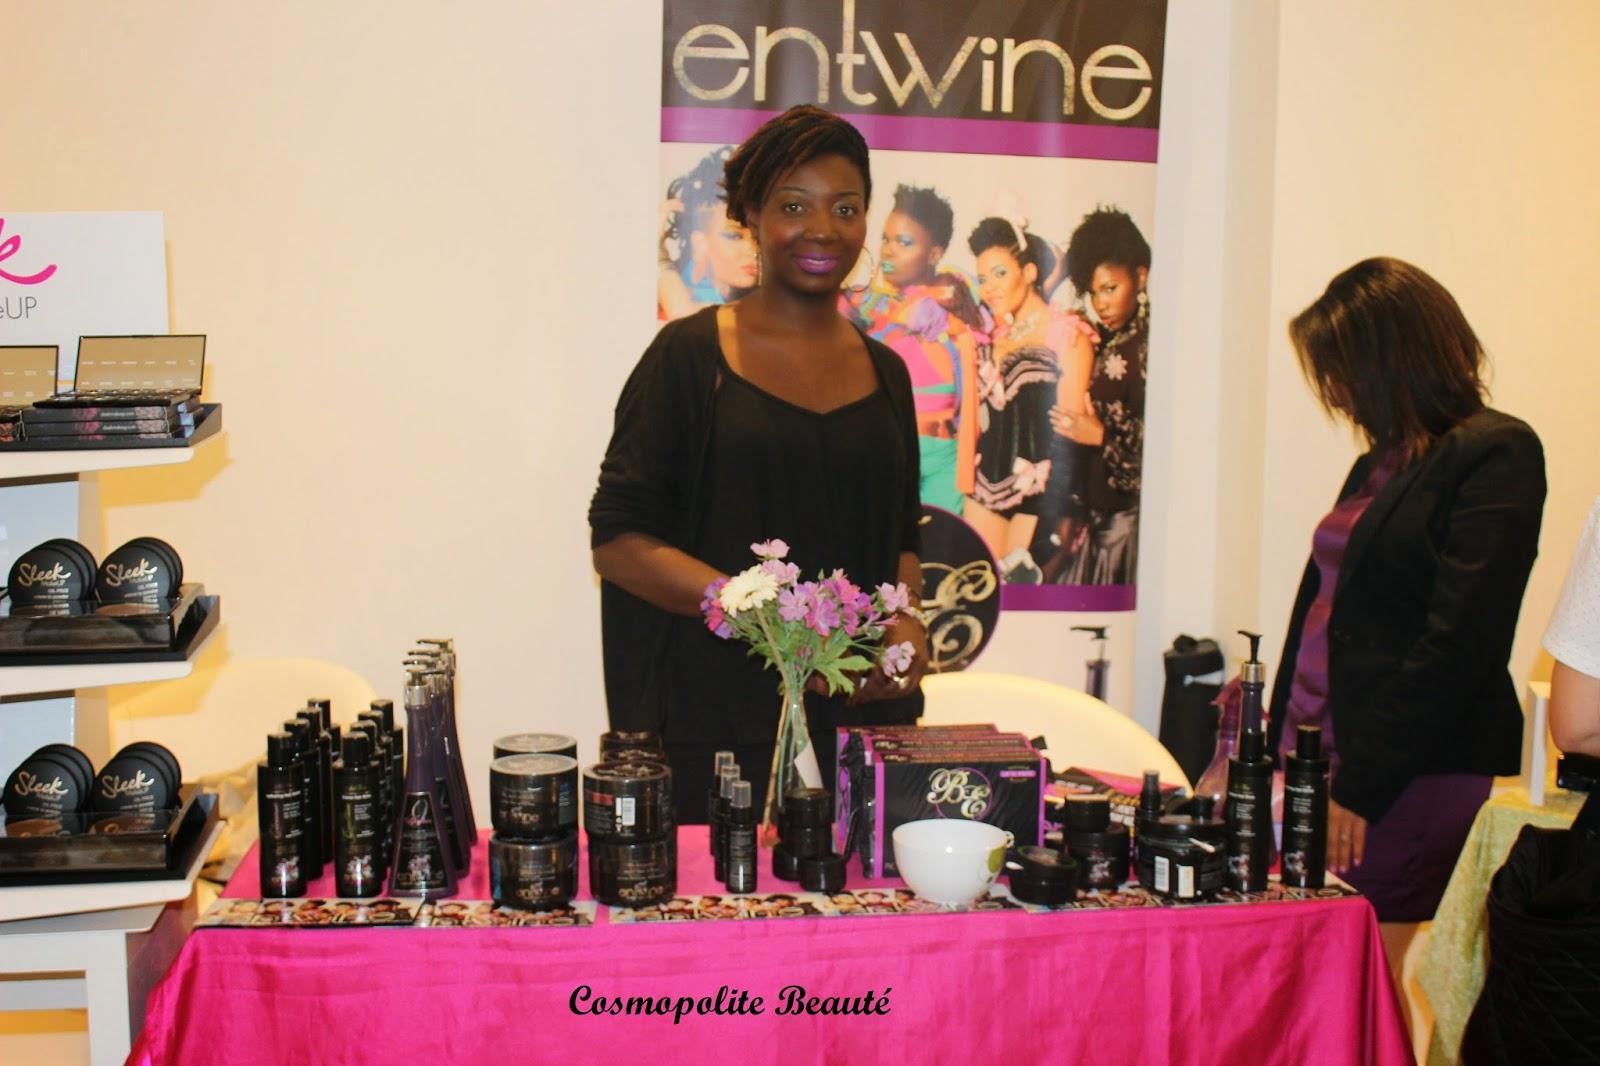 rya beauty, rencontre youtubeuses, salon beauté, beauty event, Entwine